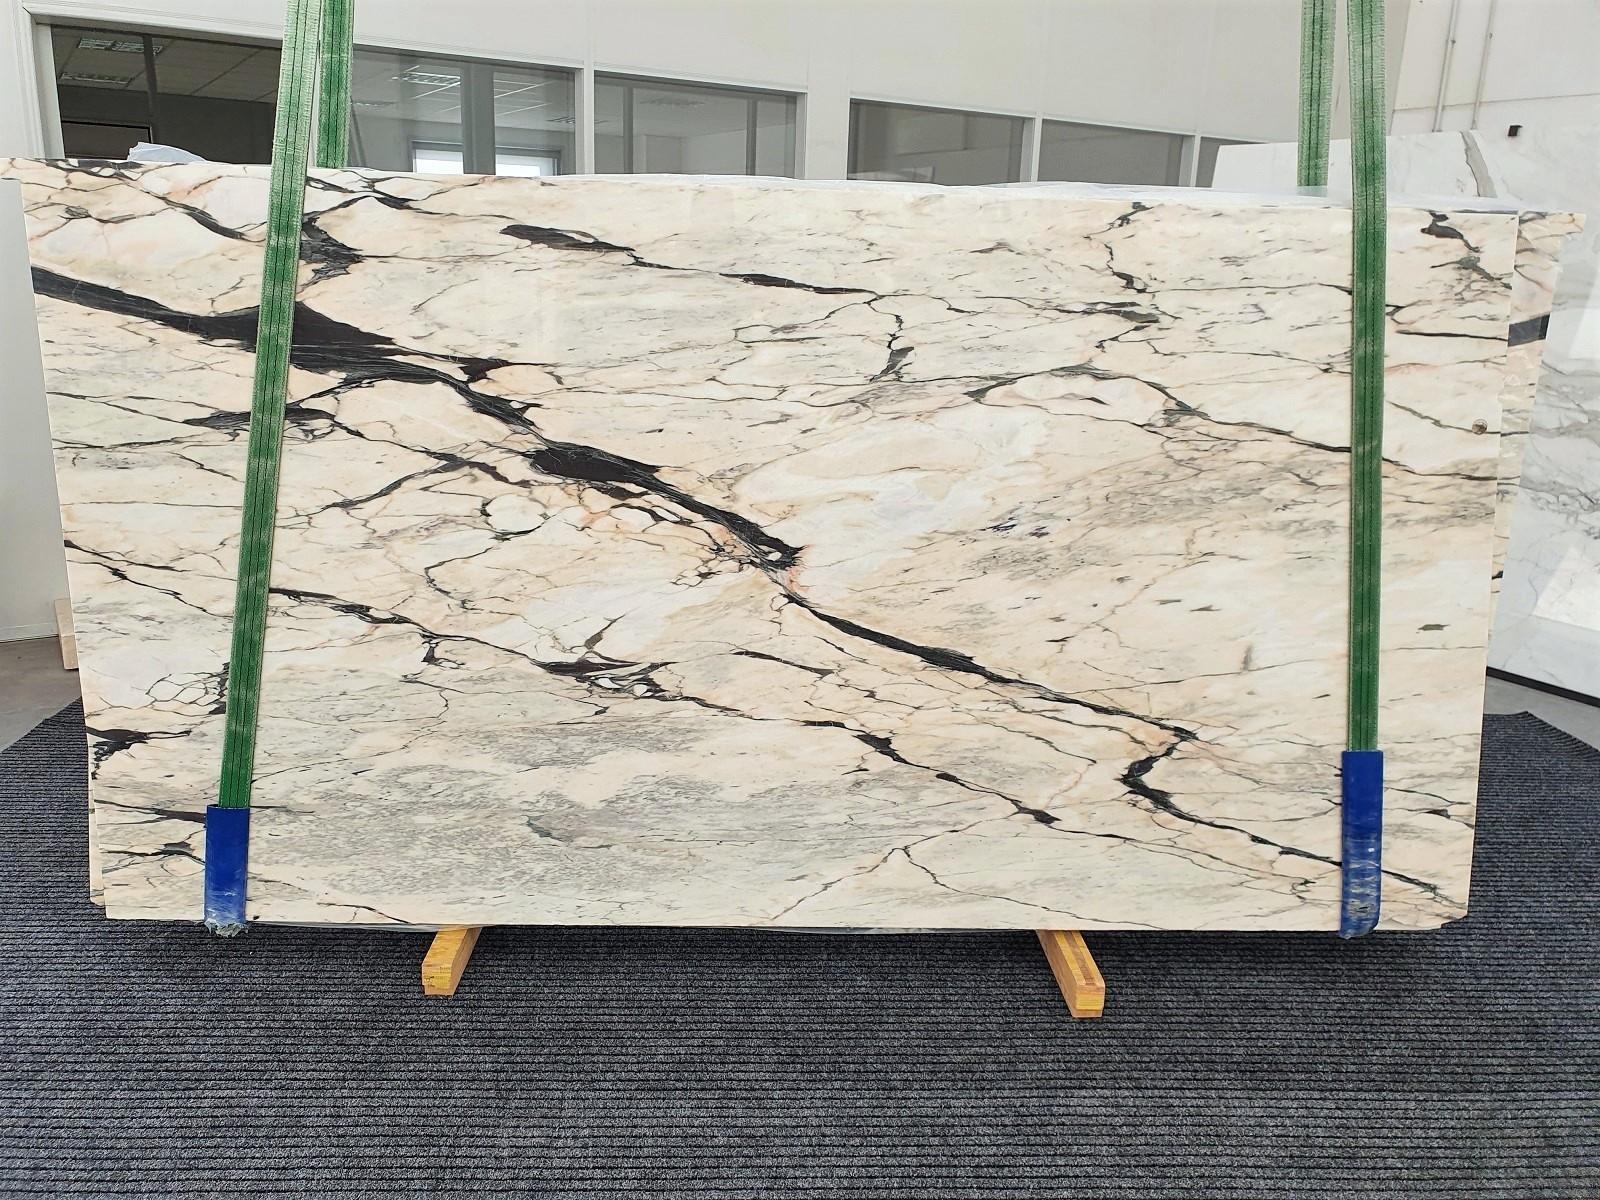 STATUARIO CORAL Fourniture Veneto (Italie) d' dalles brillantes en marbre naturel 1328 , Bundle #02